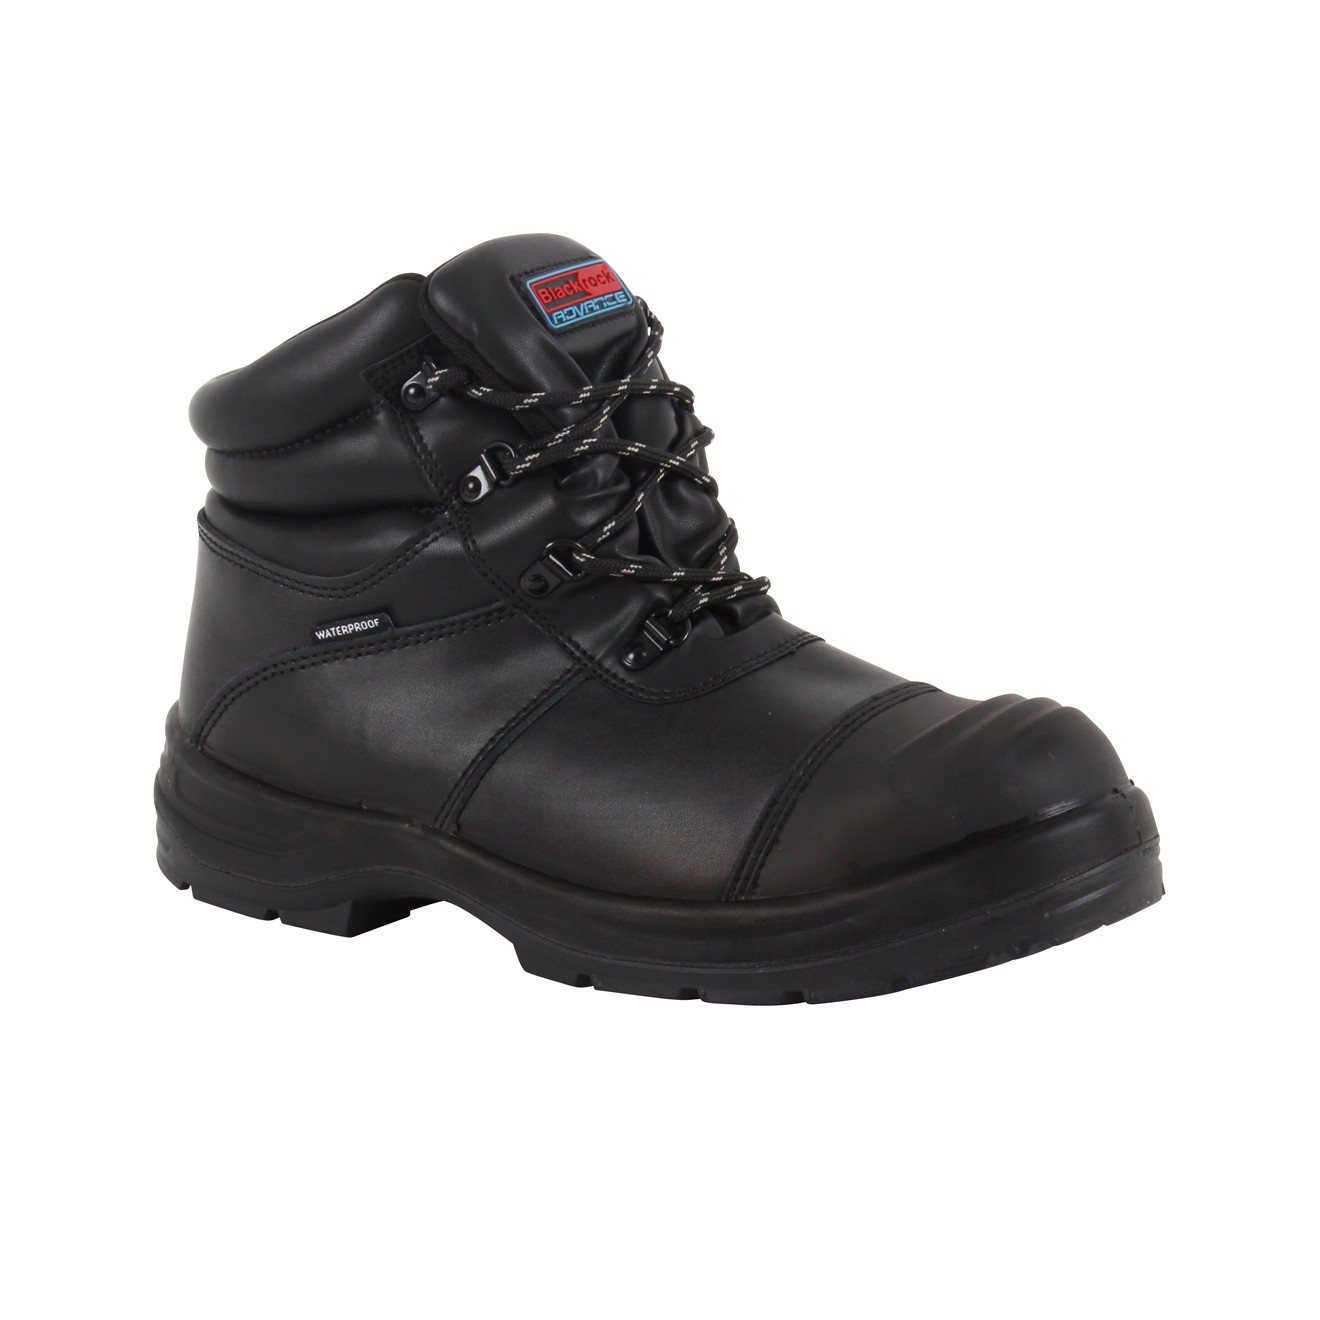 Avenger Waterproof/HRO Boot